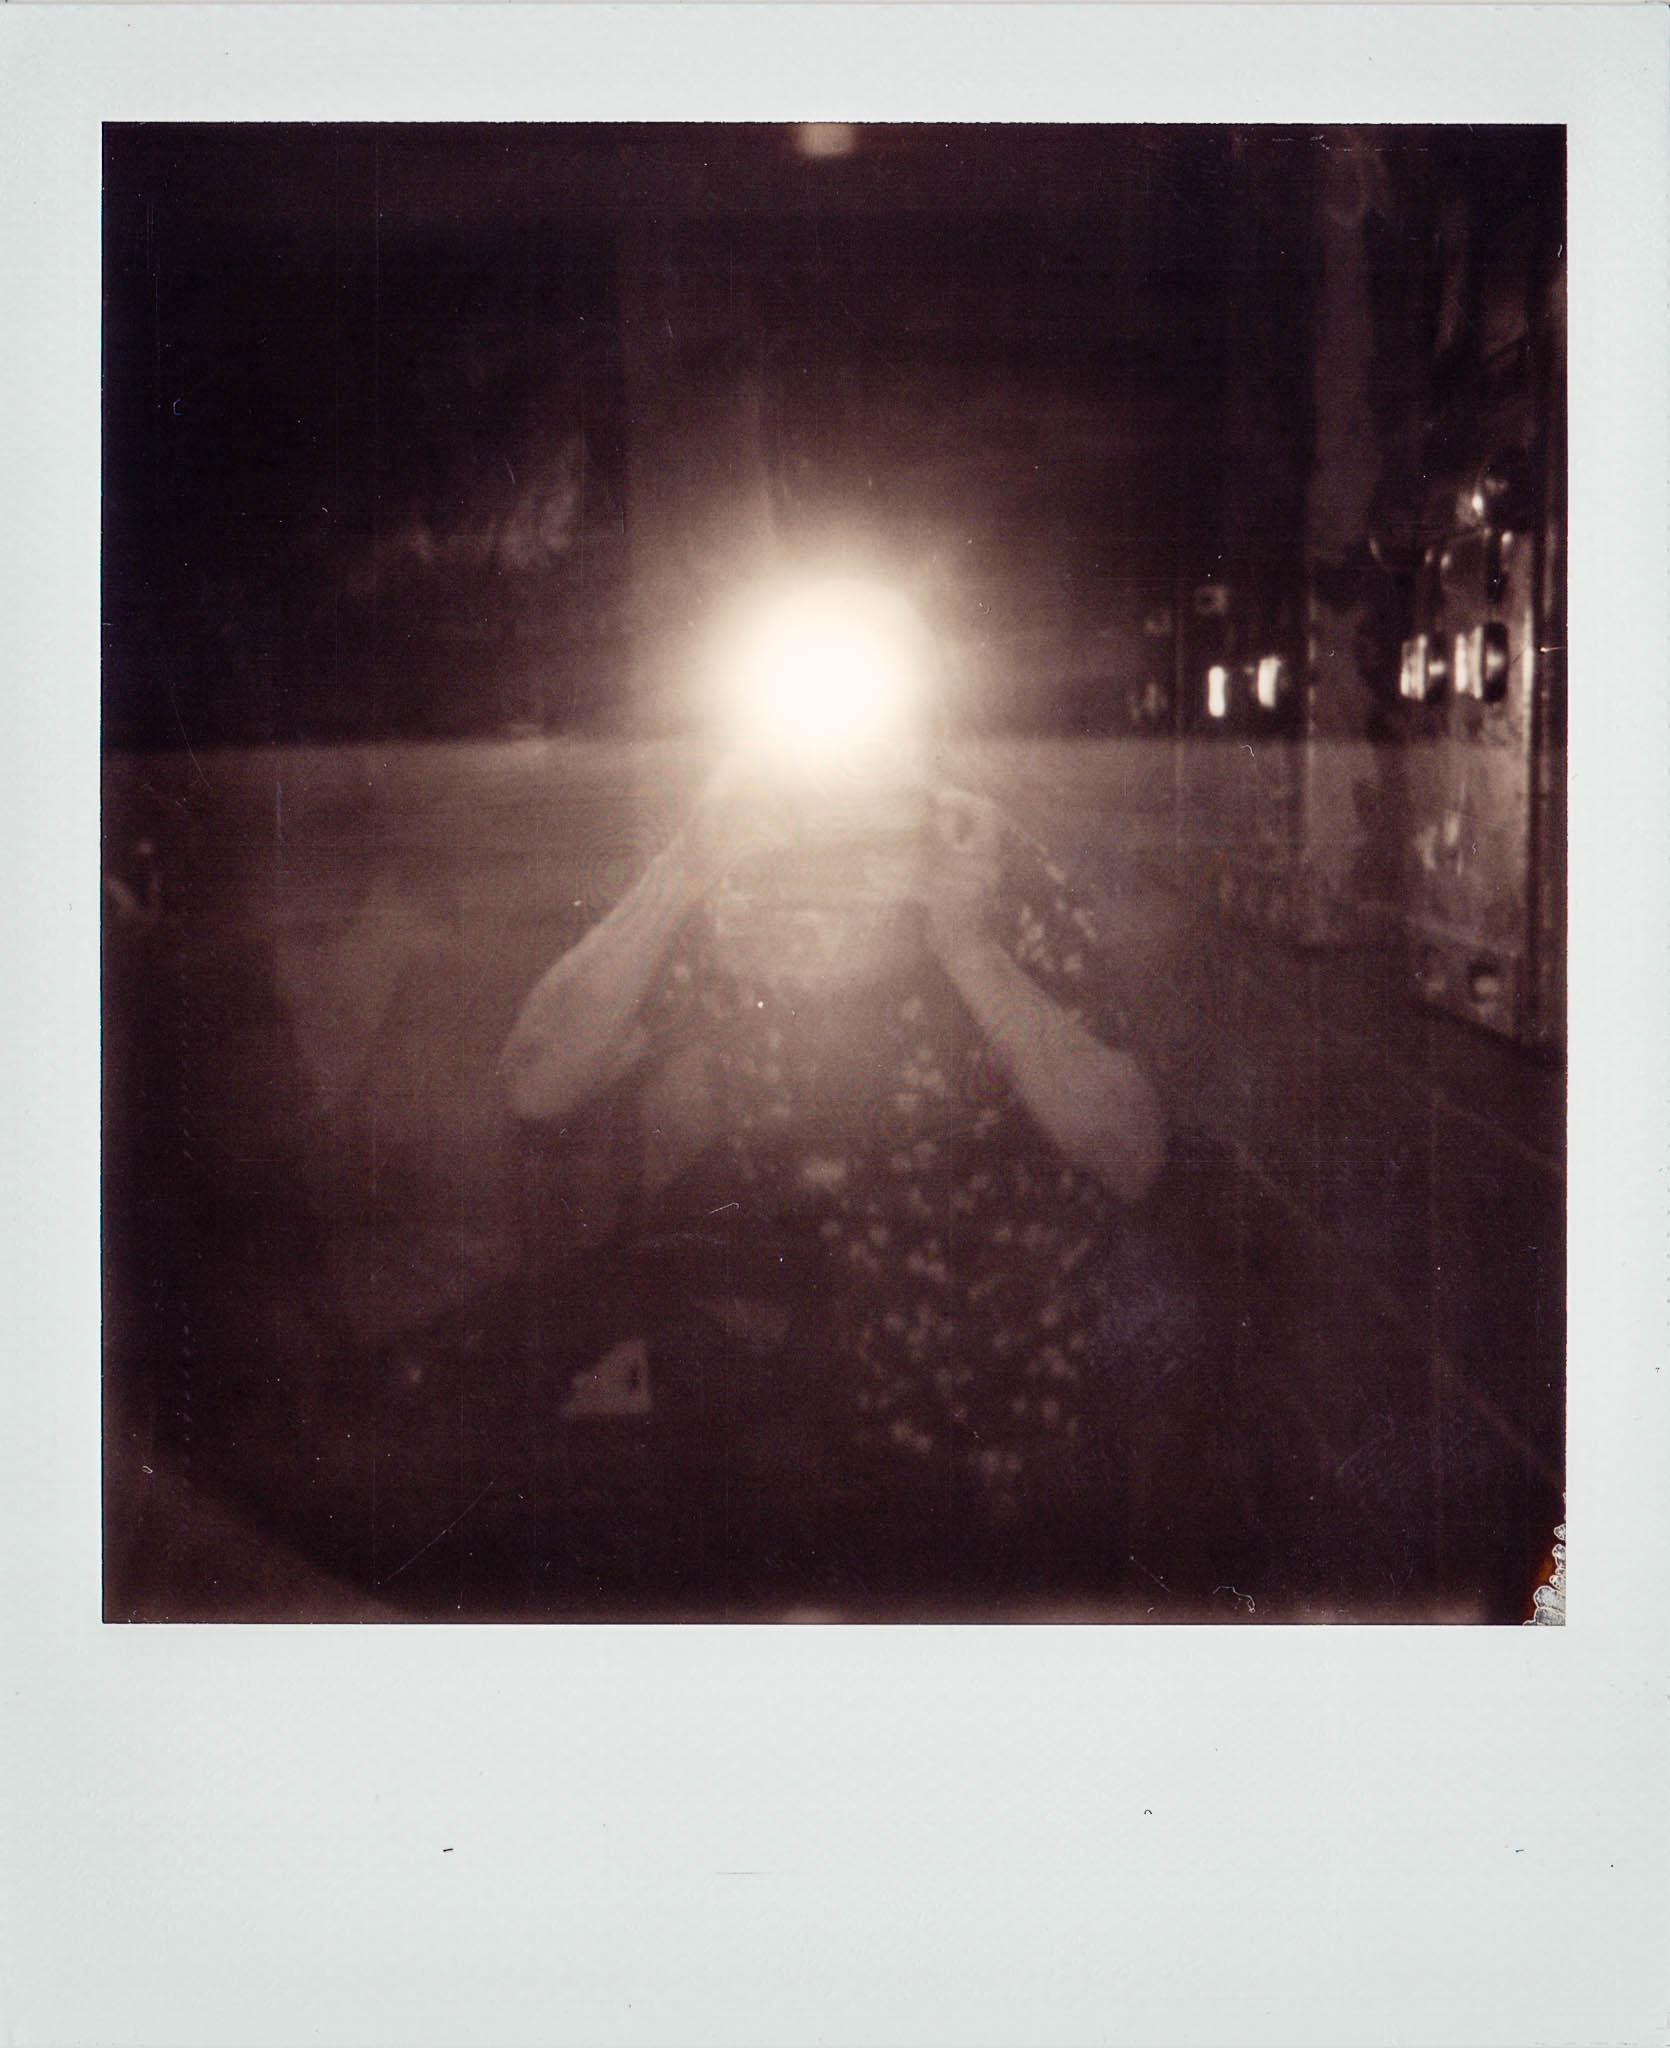 Polaroid selfie of photographer David Lawrence